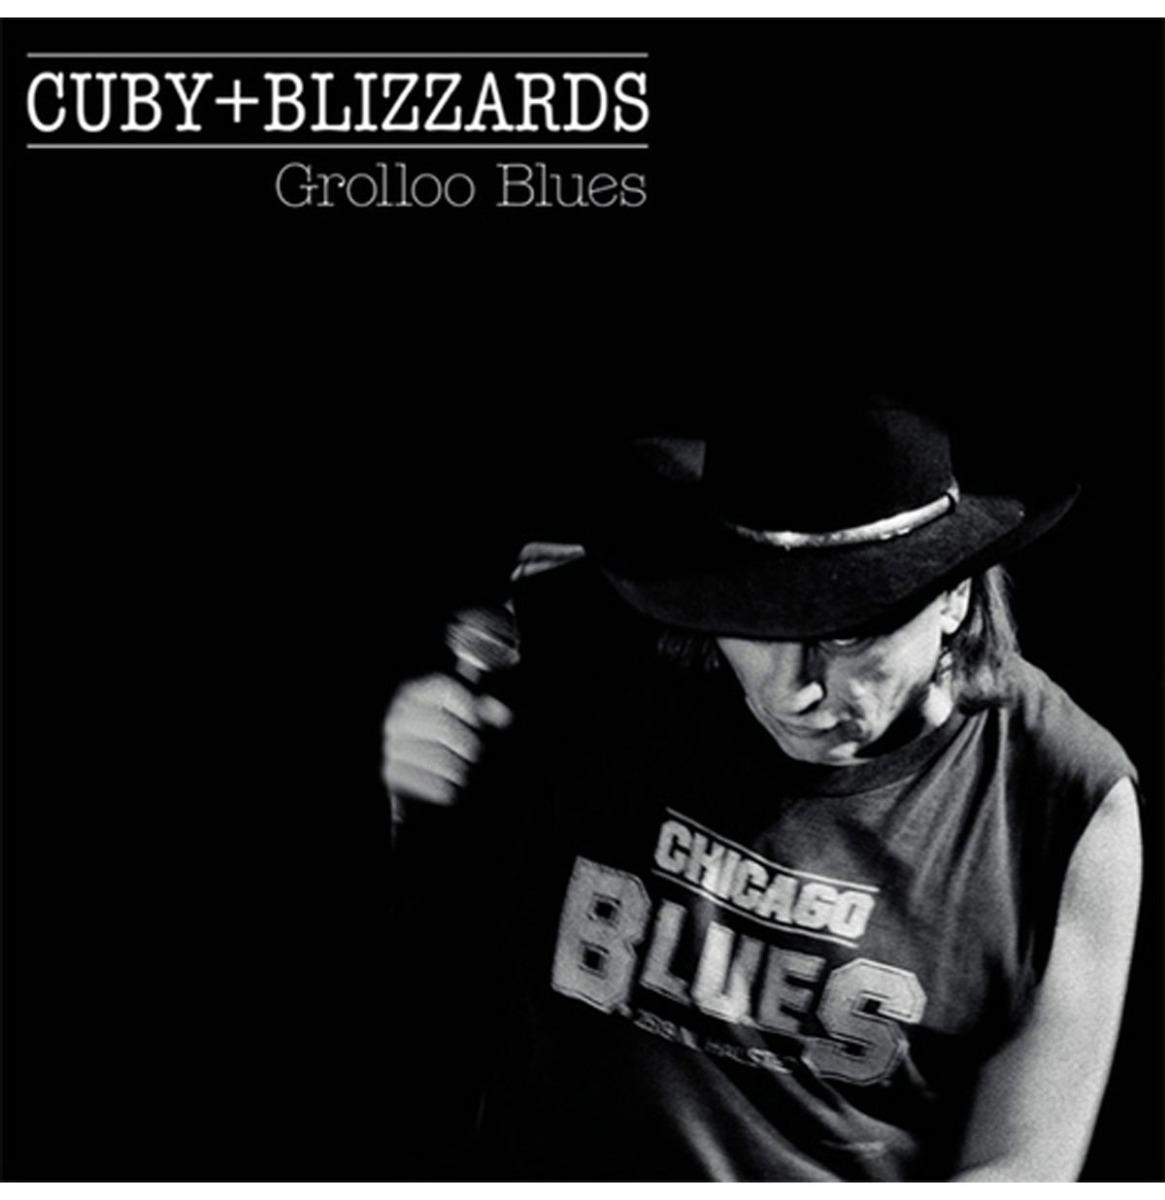 Cuby + Blizzards - Grolloo Blues 2LP